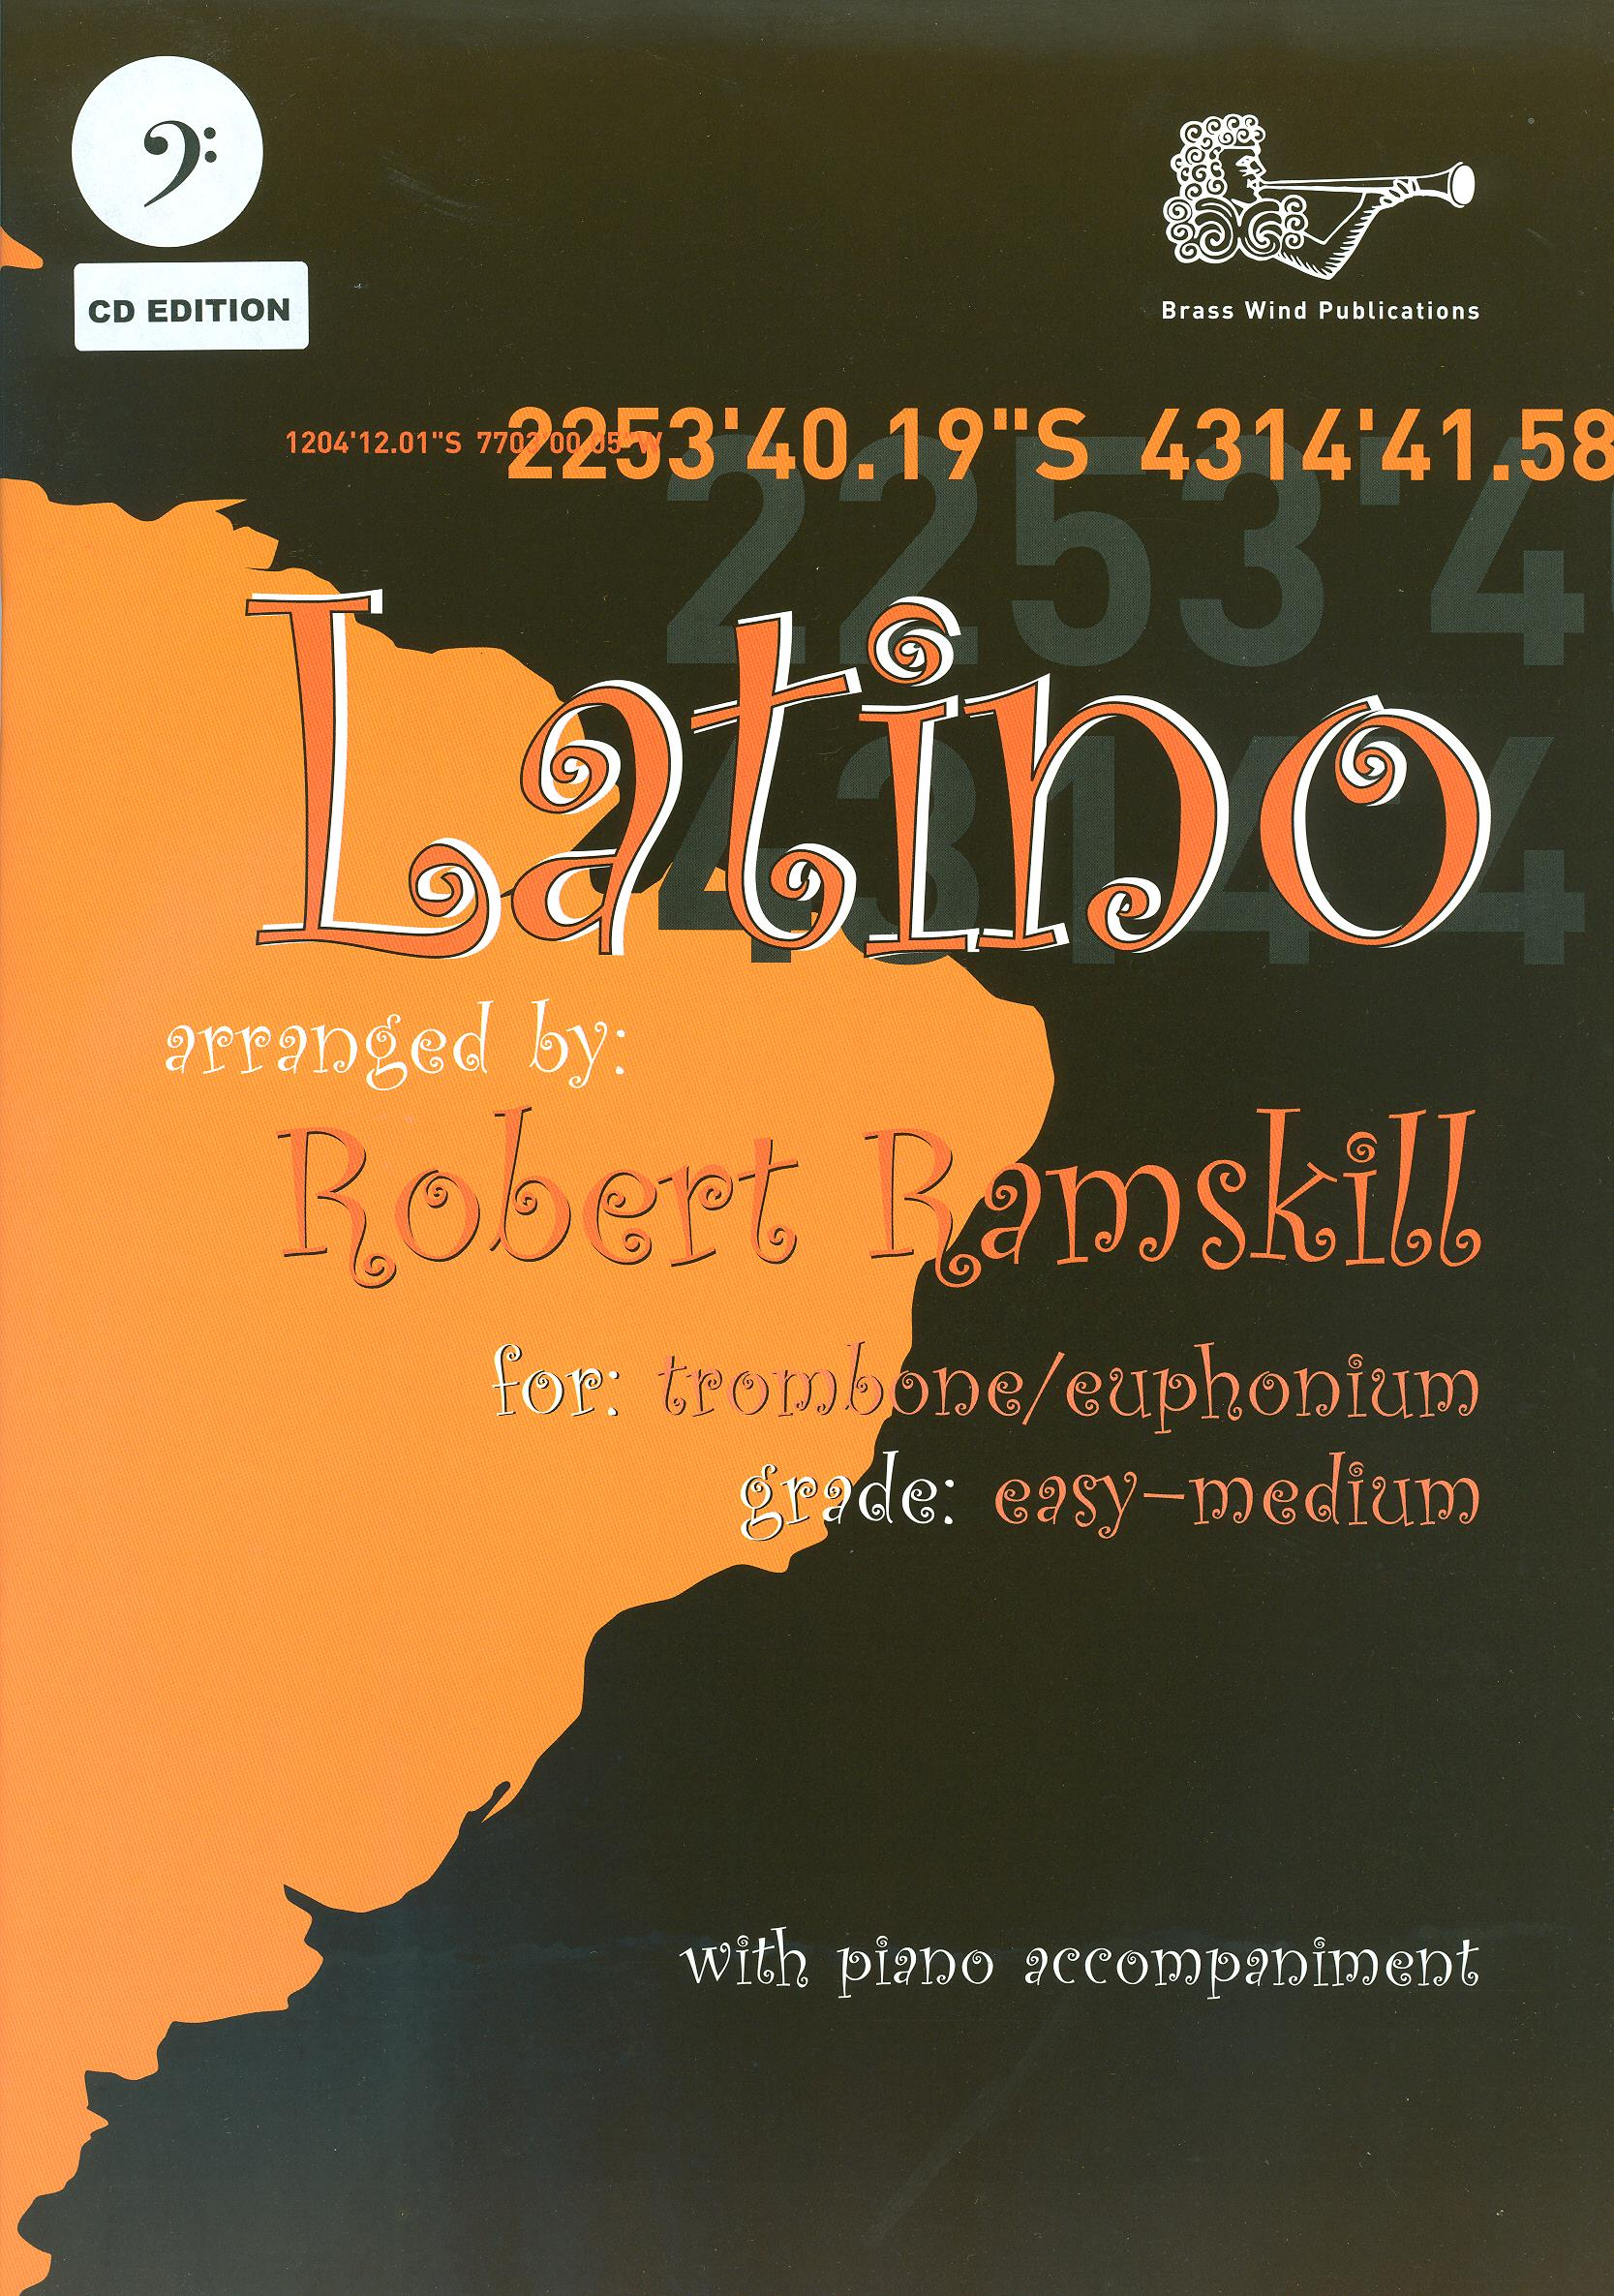 Latino for Trombone/Euphonium (Bass Clef) with CD